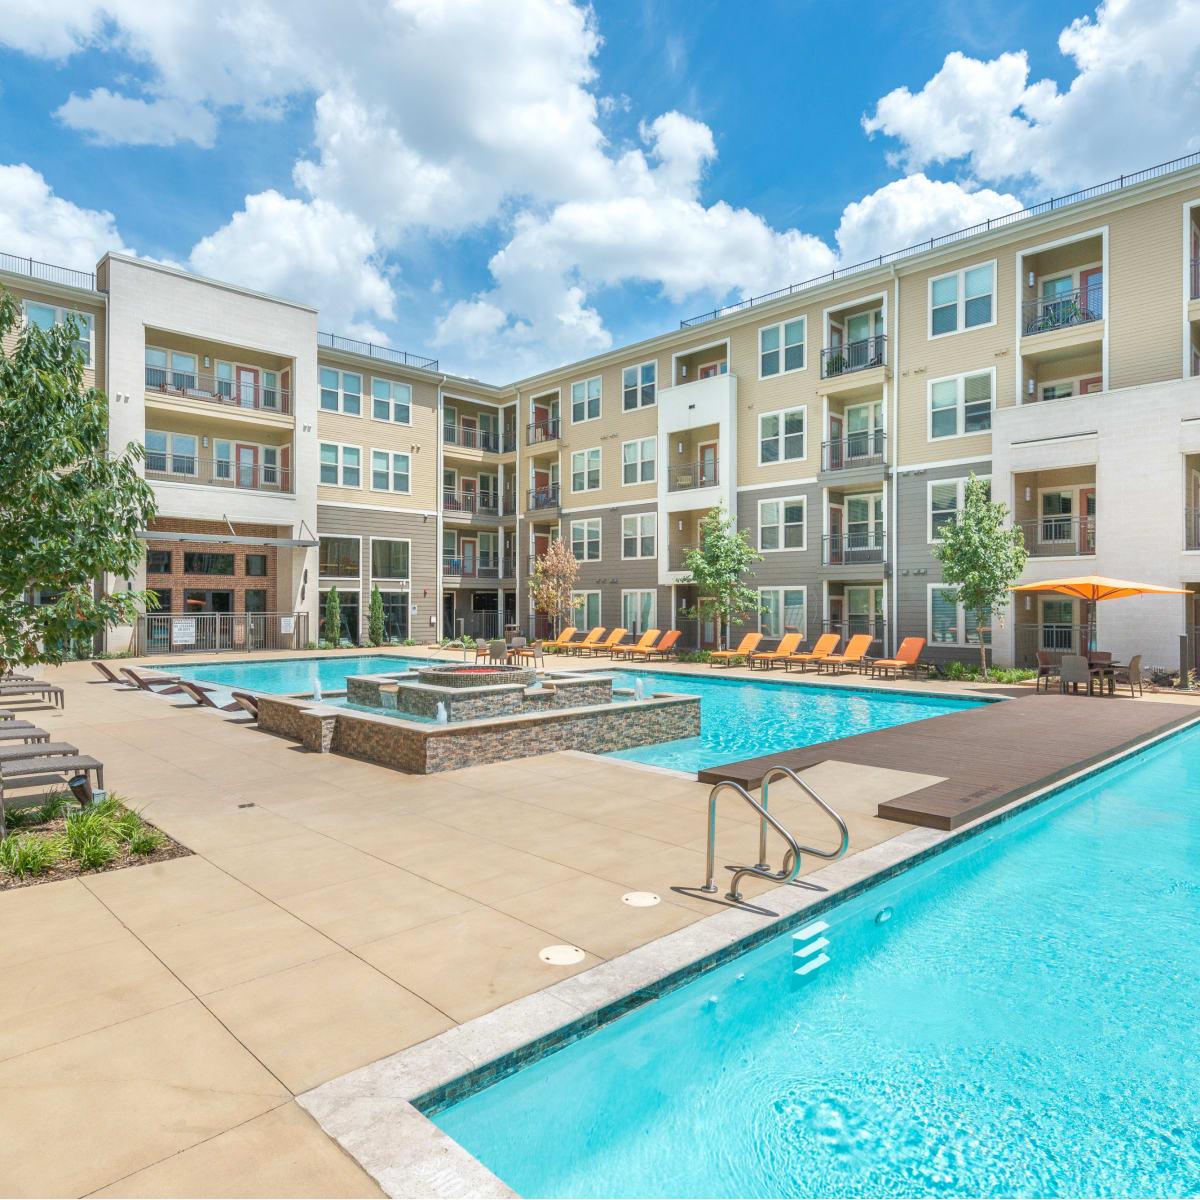 Elan West 7th apartments